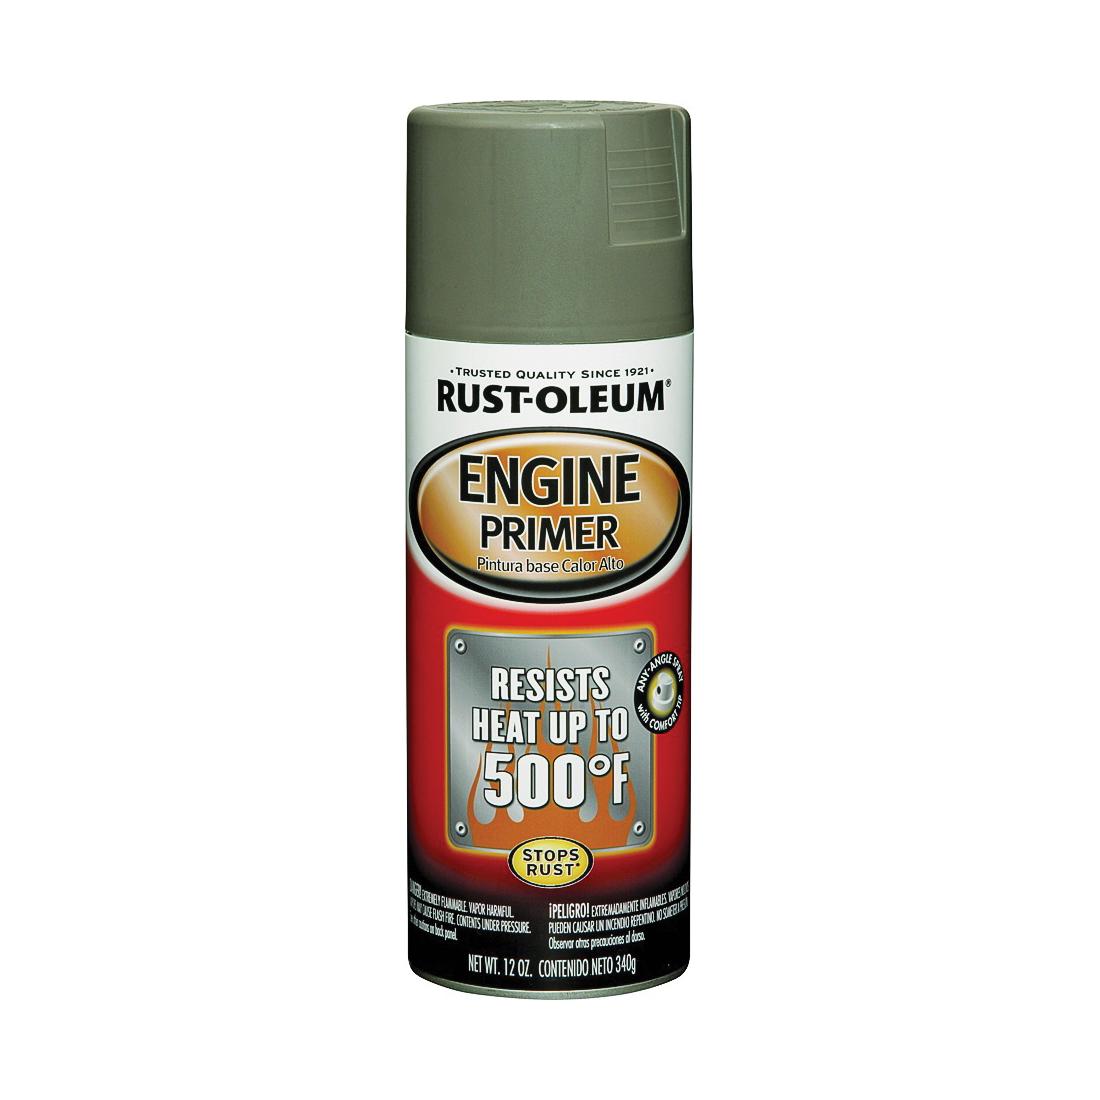 Picture of RUST-OLEUM AUTOMOTIVE 249410 Engine Primer Spray Paint, Gray, 12 oz, Aerosol Can